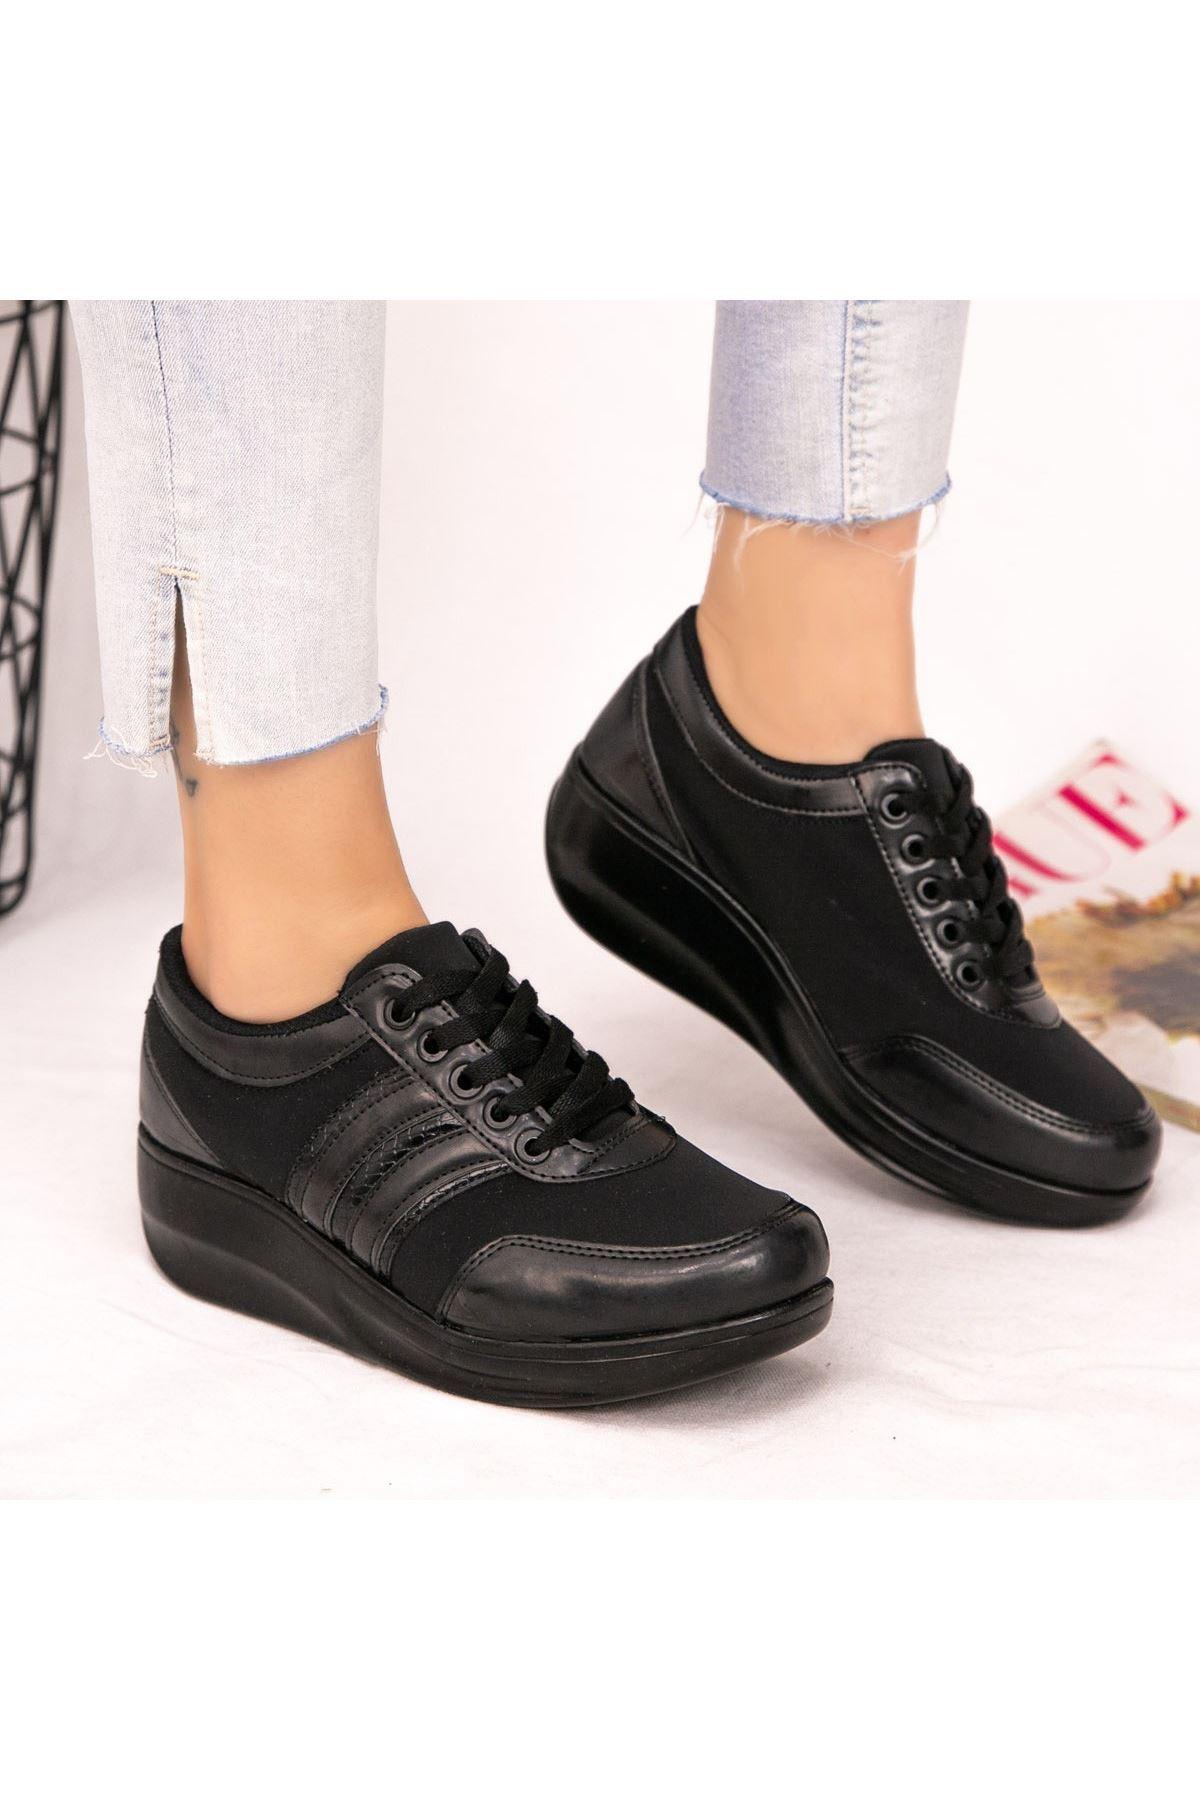 Tinos Siyah Cilt Bağcıklı Spor Ayakkabı